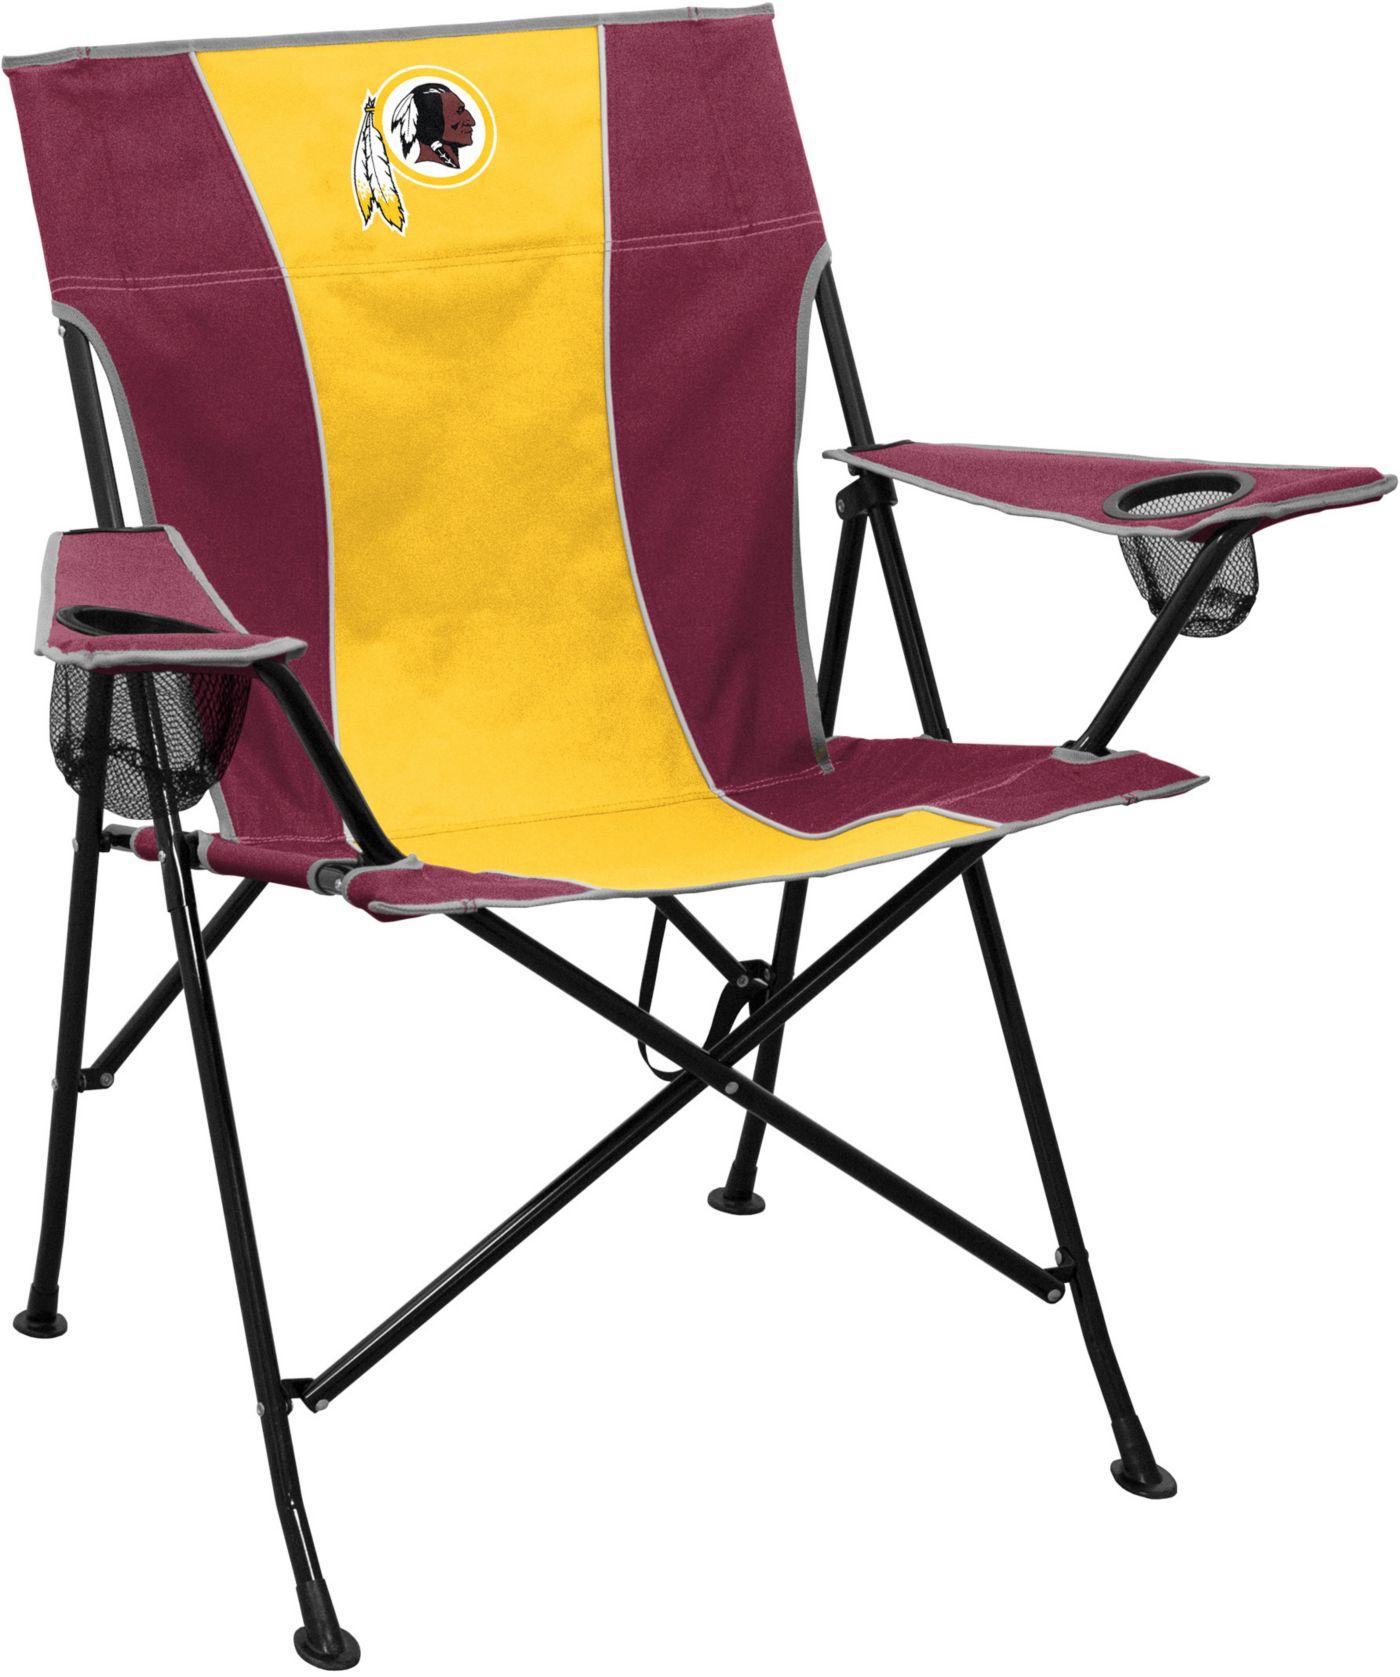 Washington Redskins Pregame Chair